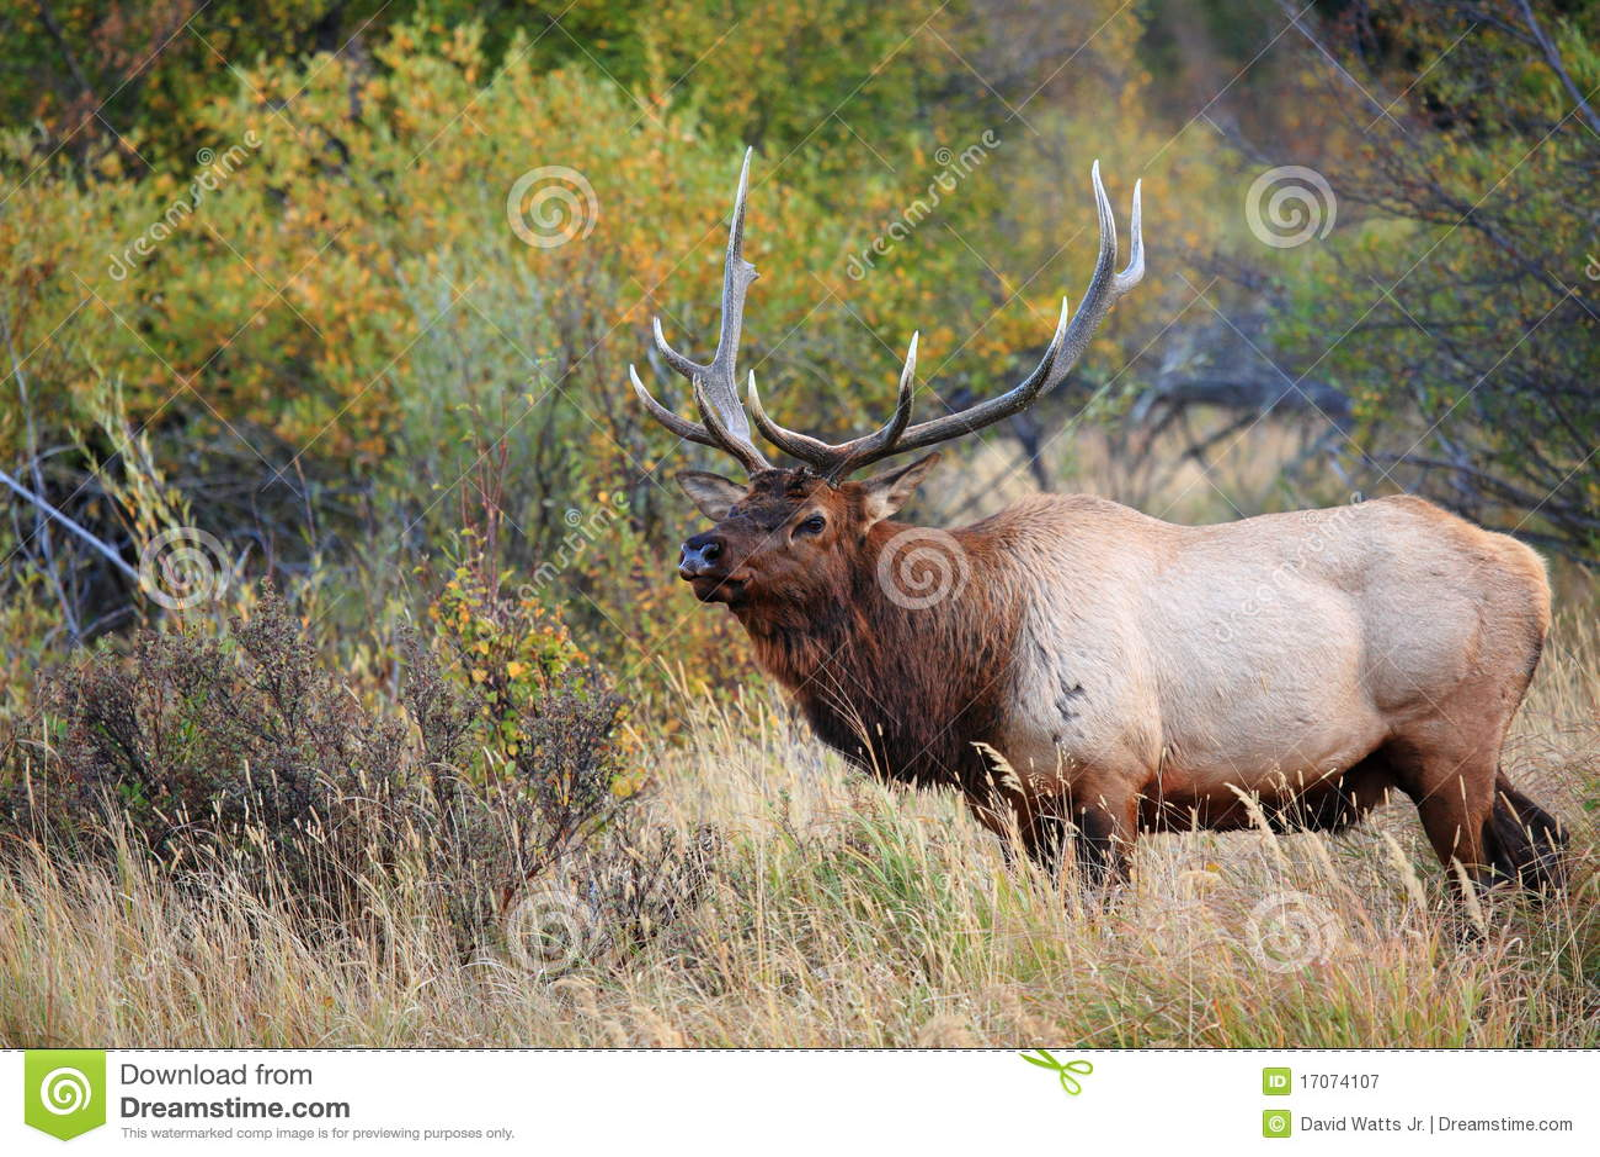 Bull elk pictures free